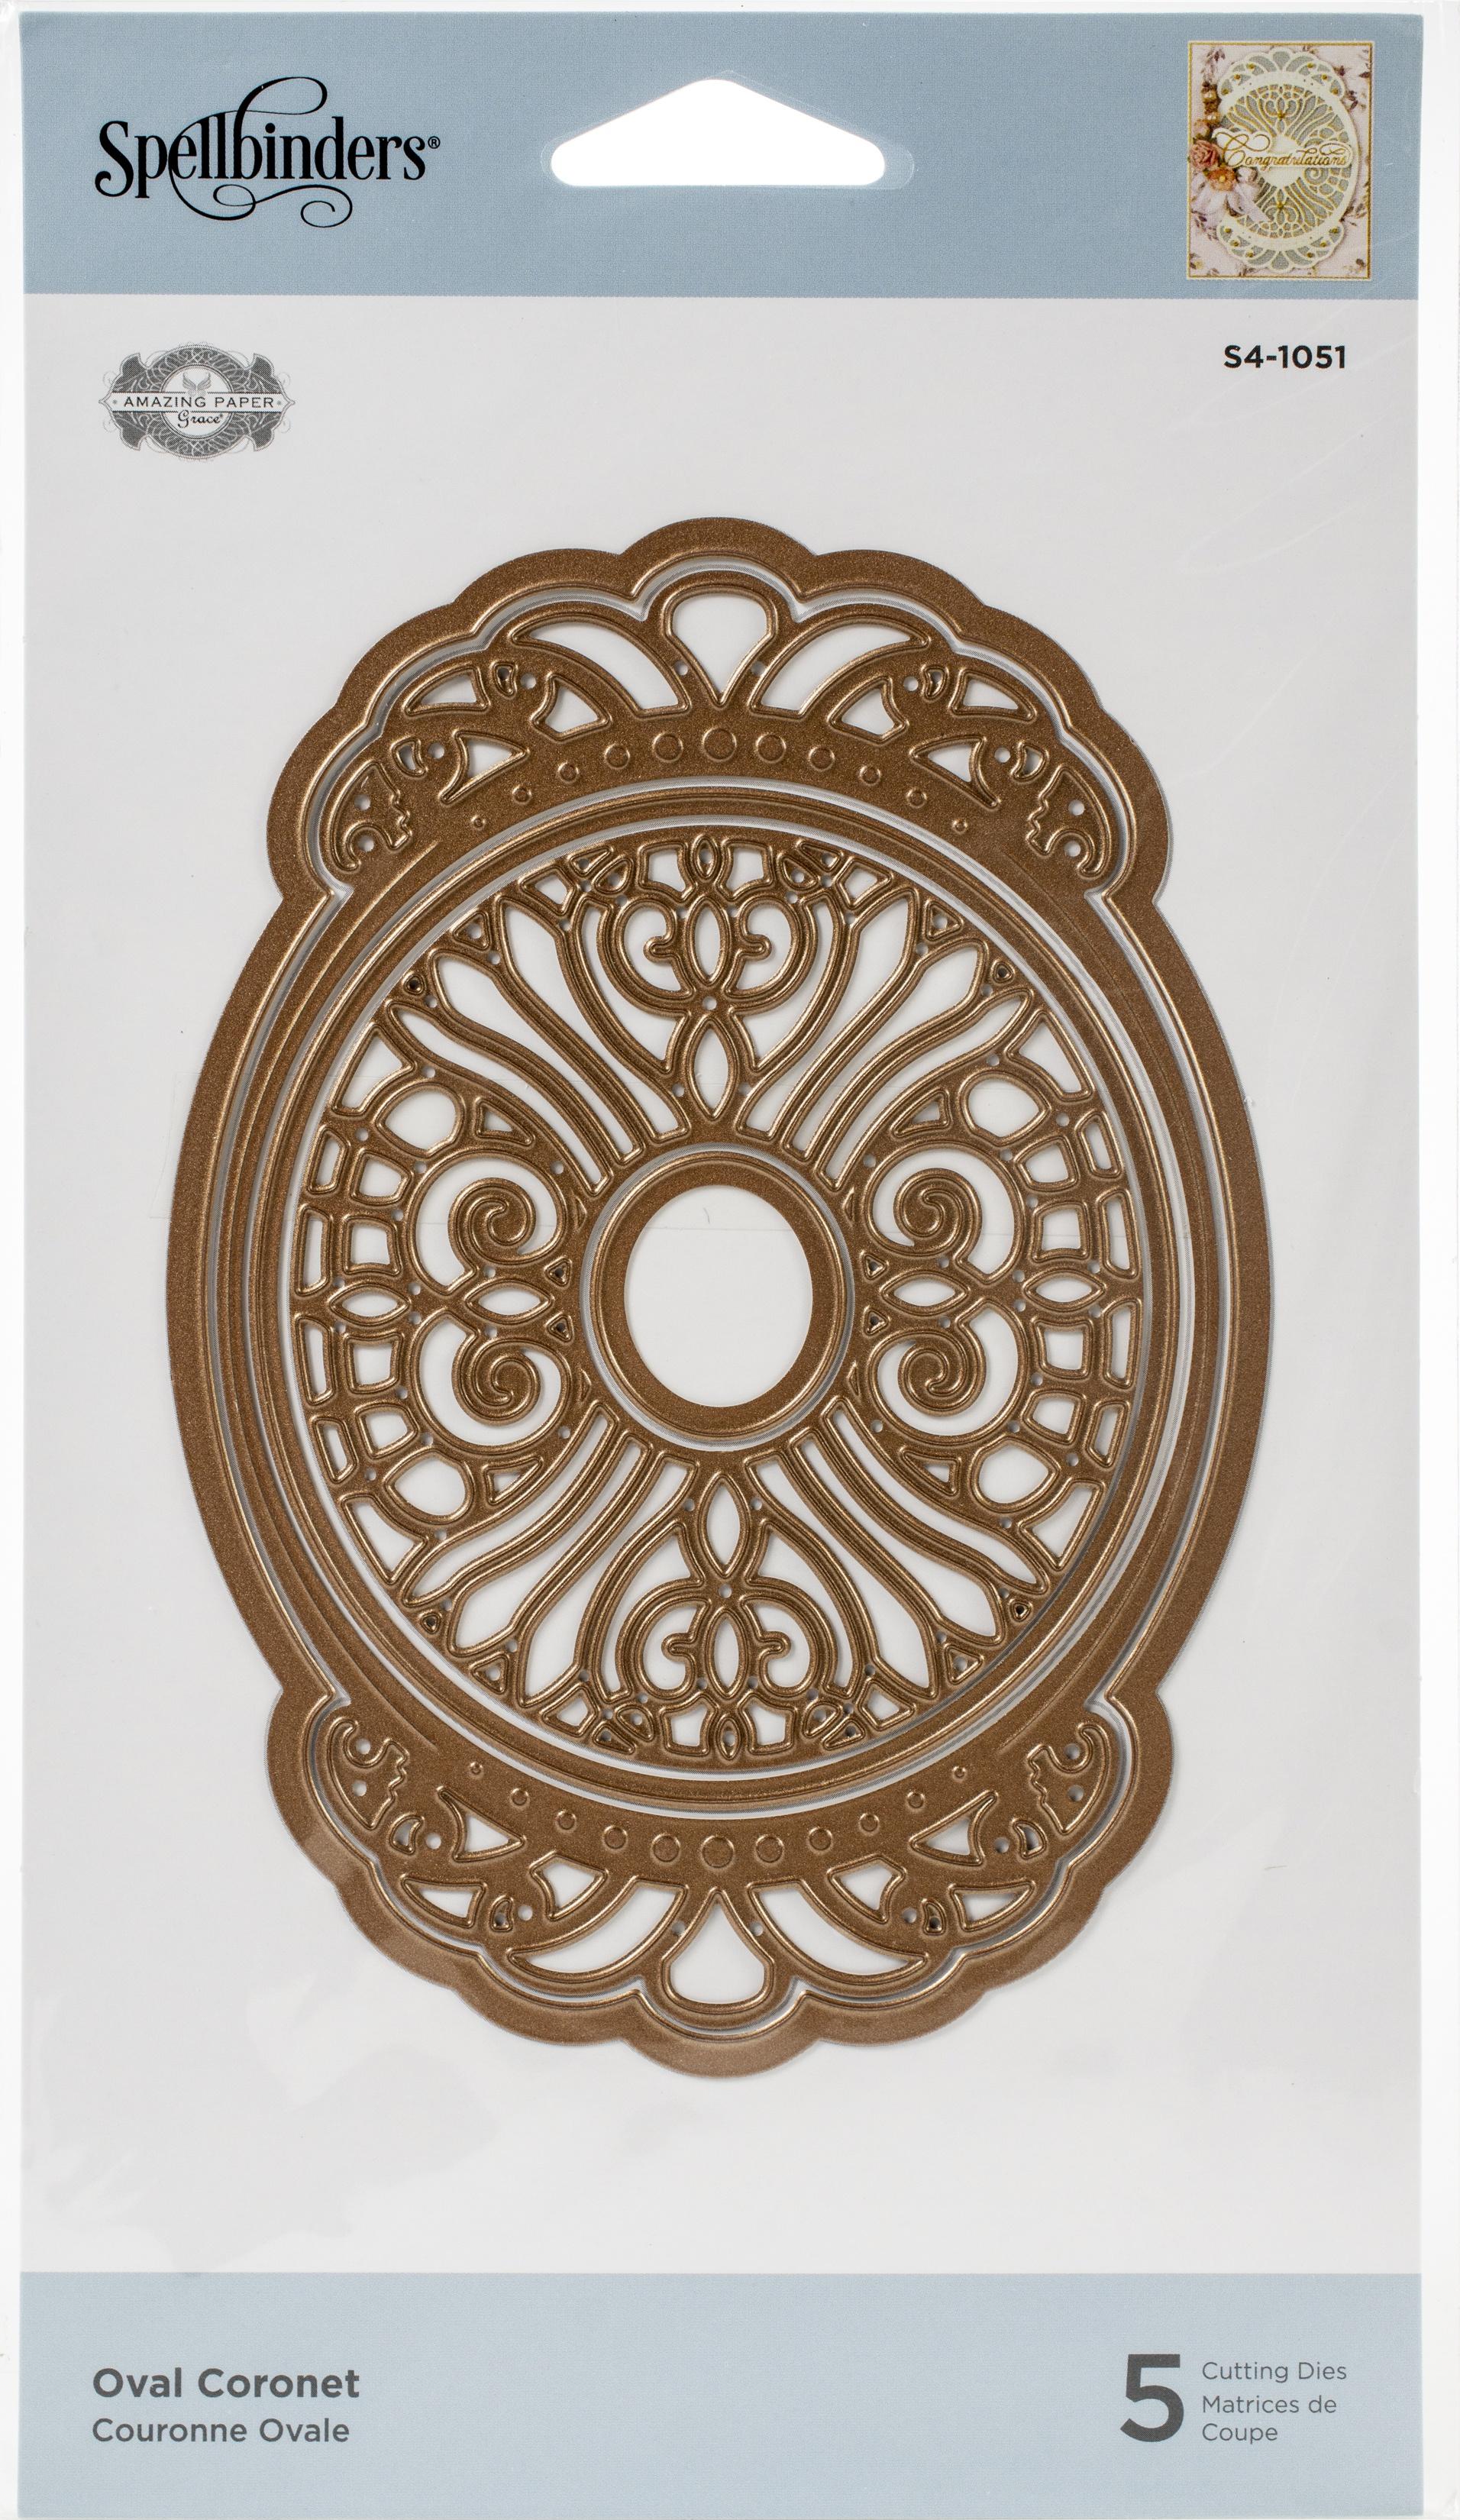 Spellbinders Flourished Fretwork Etched Die By Becca Feeken-Oval Coronet